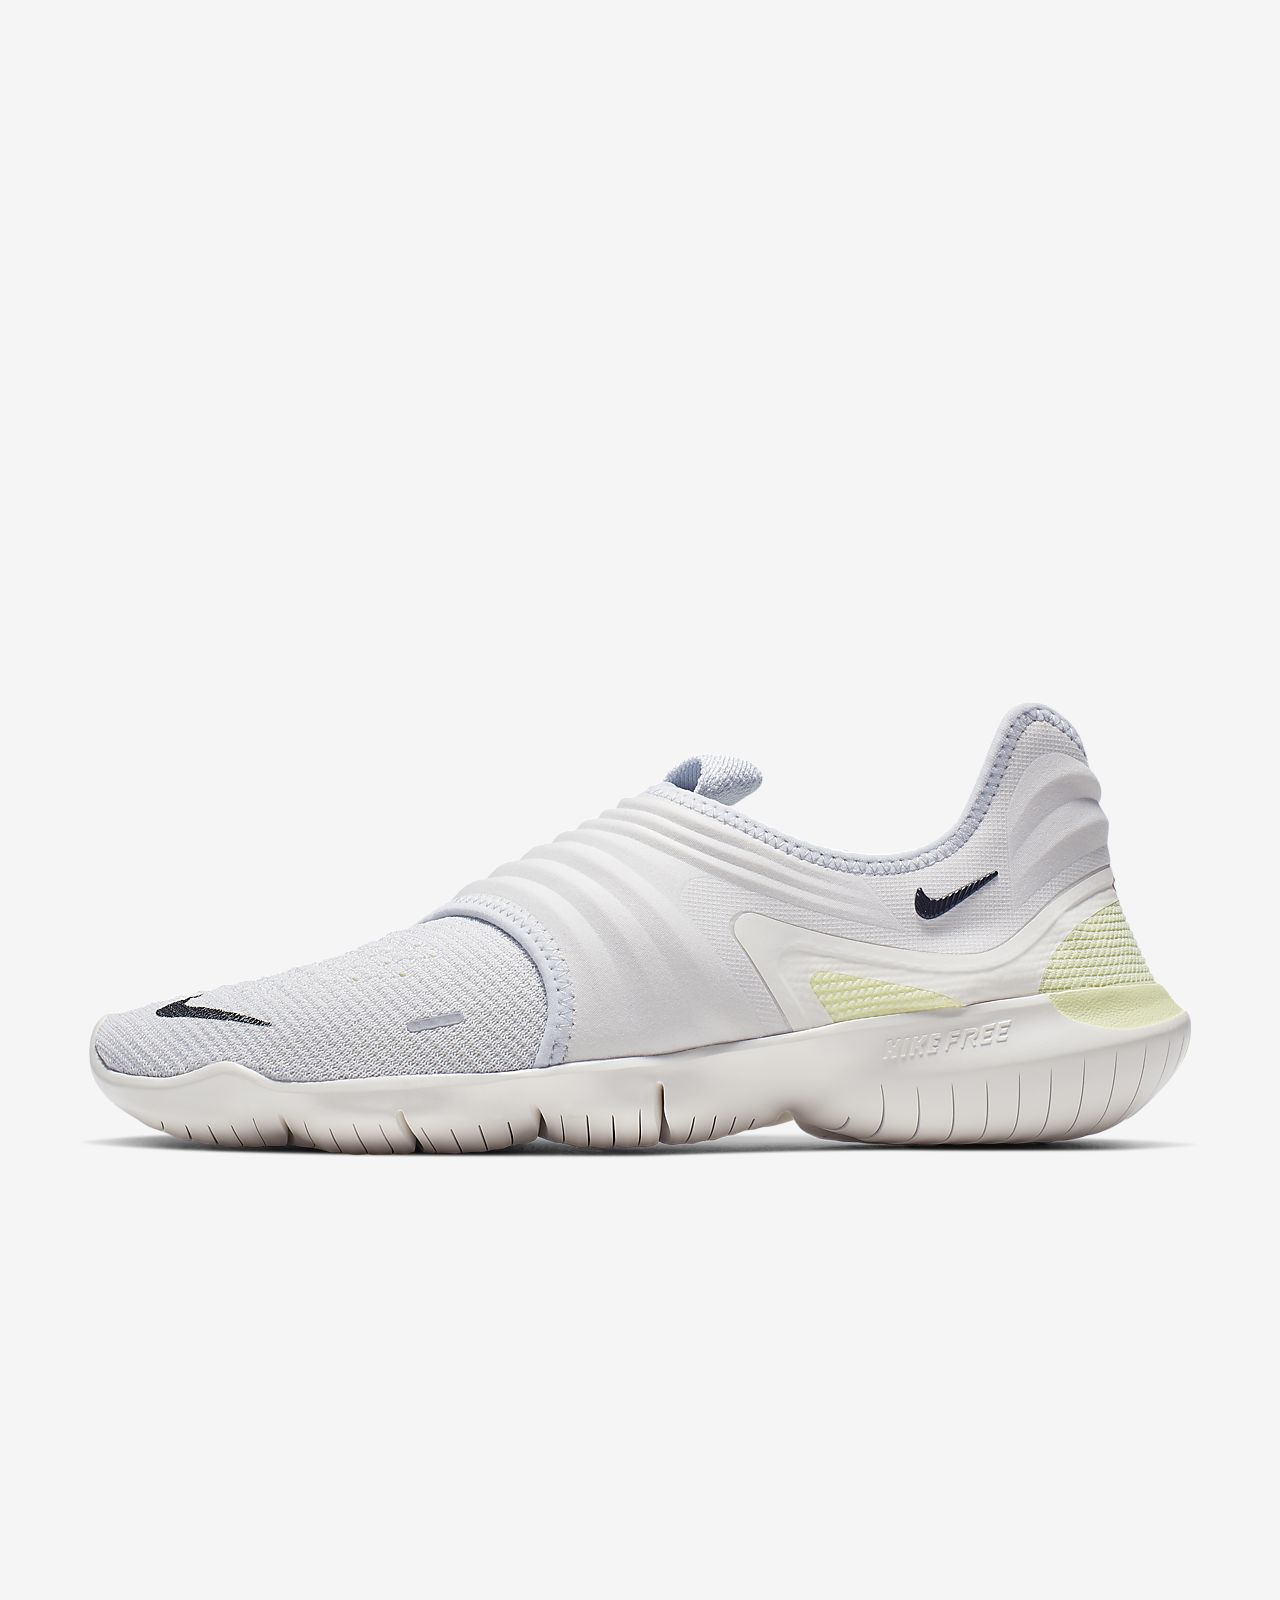 ffb7c98433a010 Nike Free RN Flyknit 3.0 Herren-Laufschuh. Nike.com AT